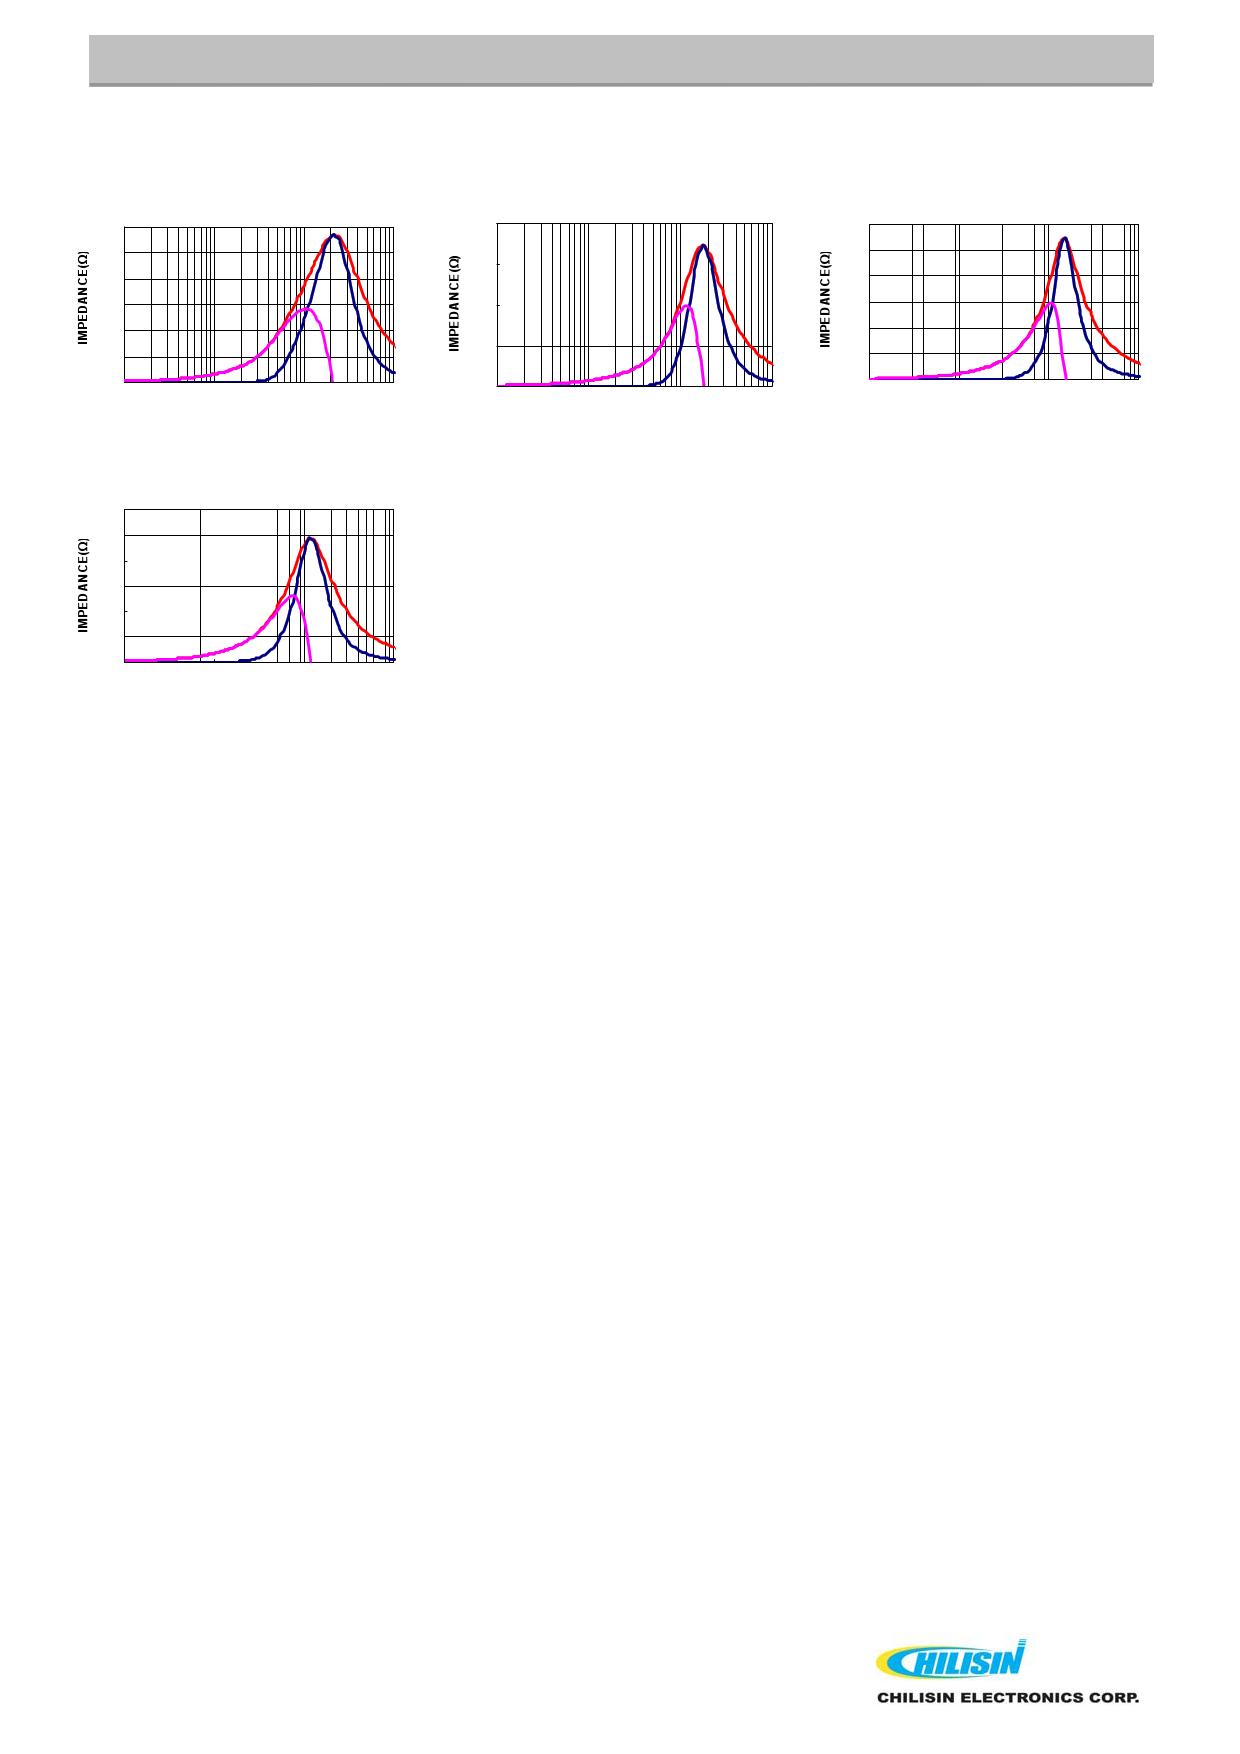 SBY321611T pdf, 반도체, 판매, 대치품